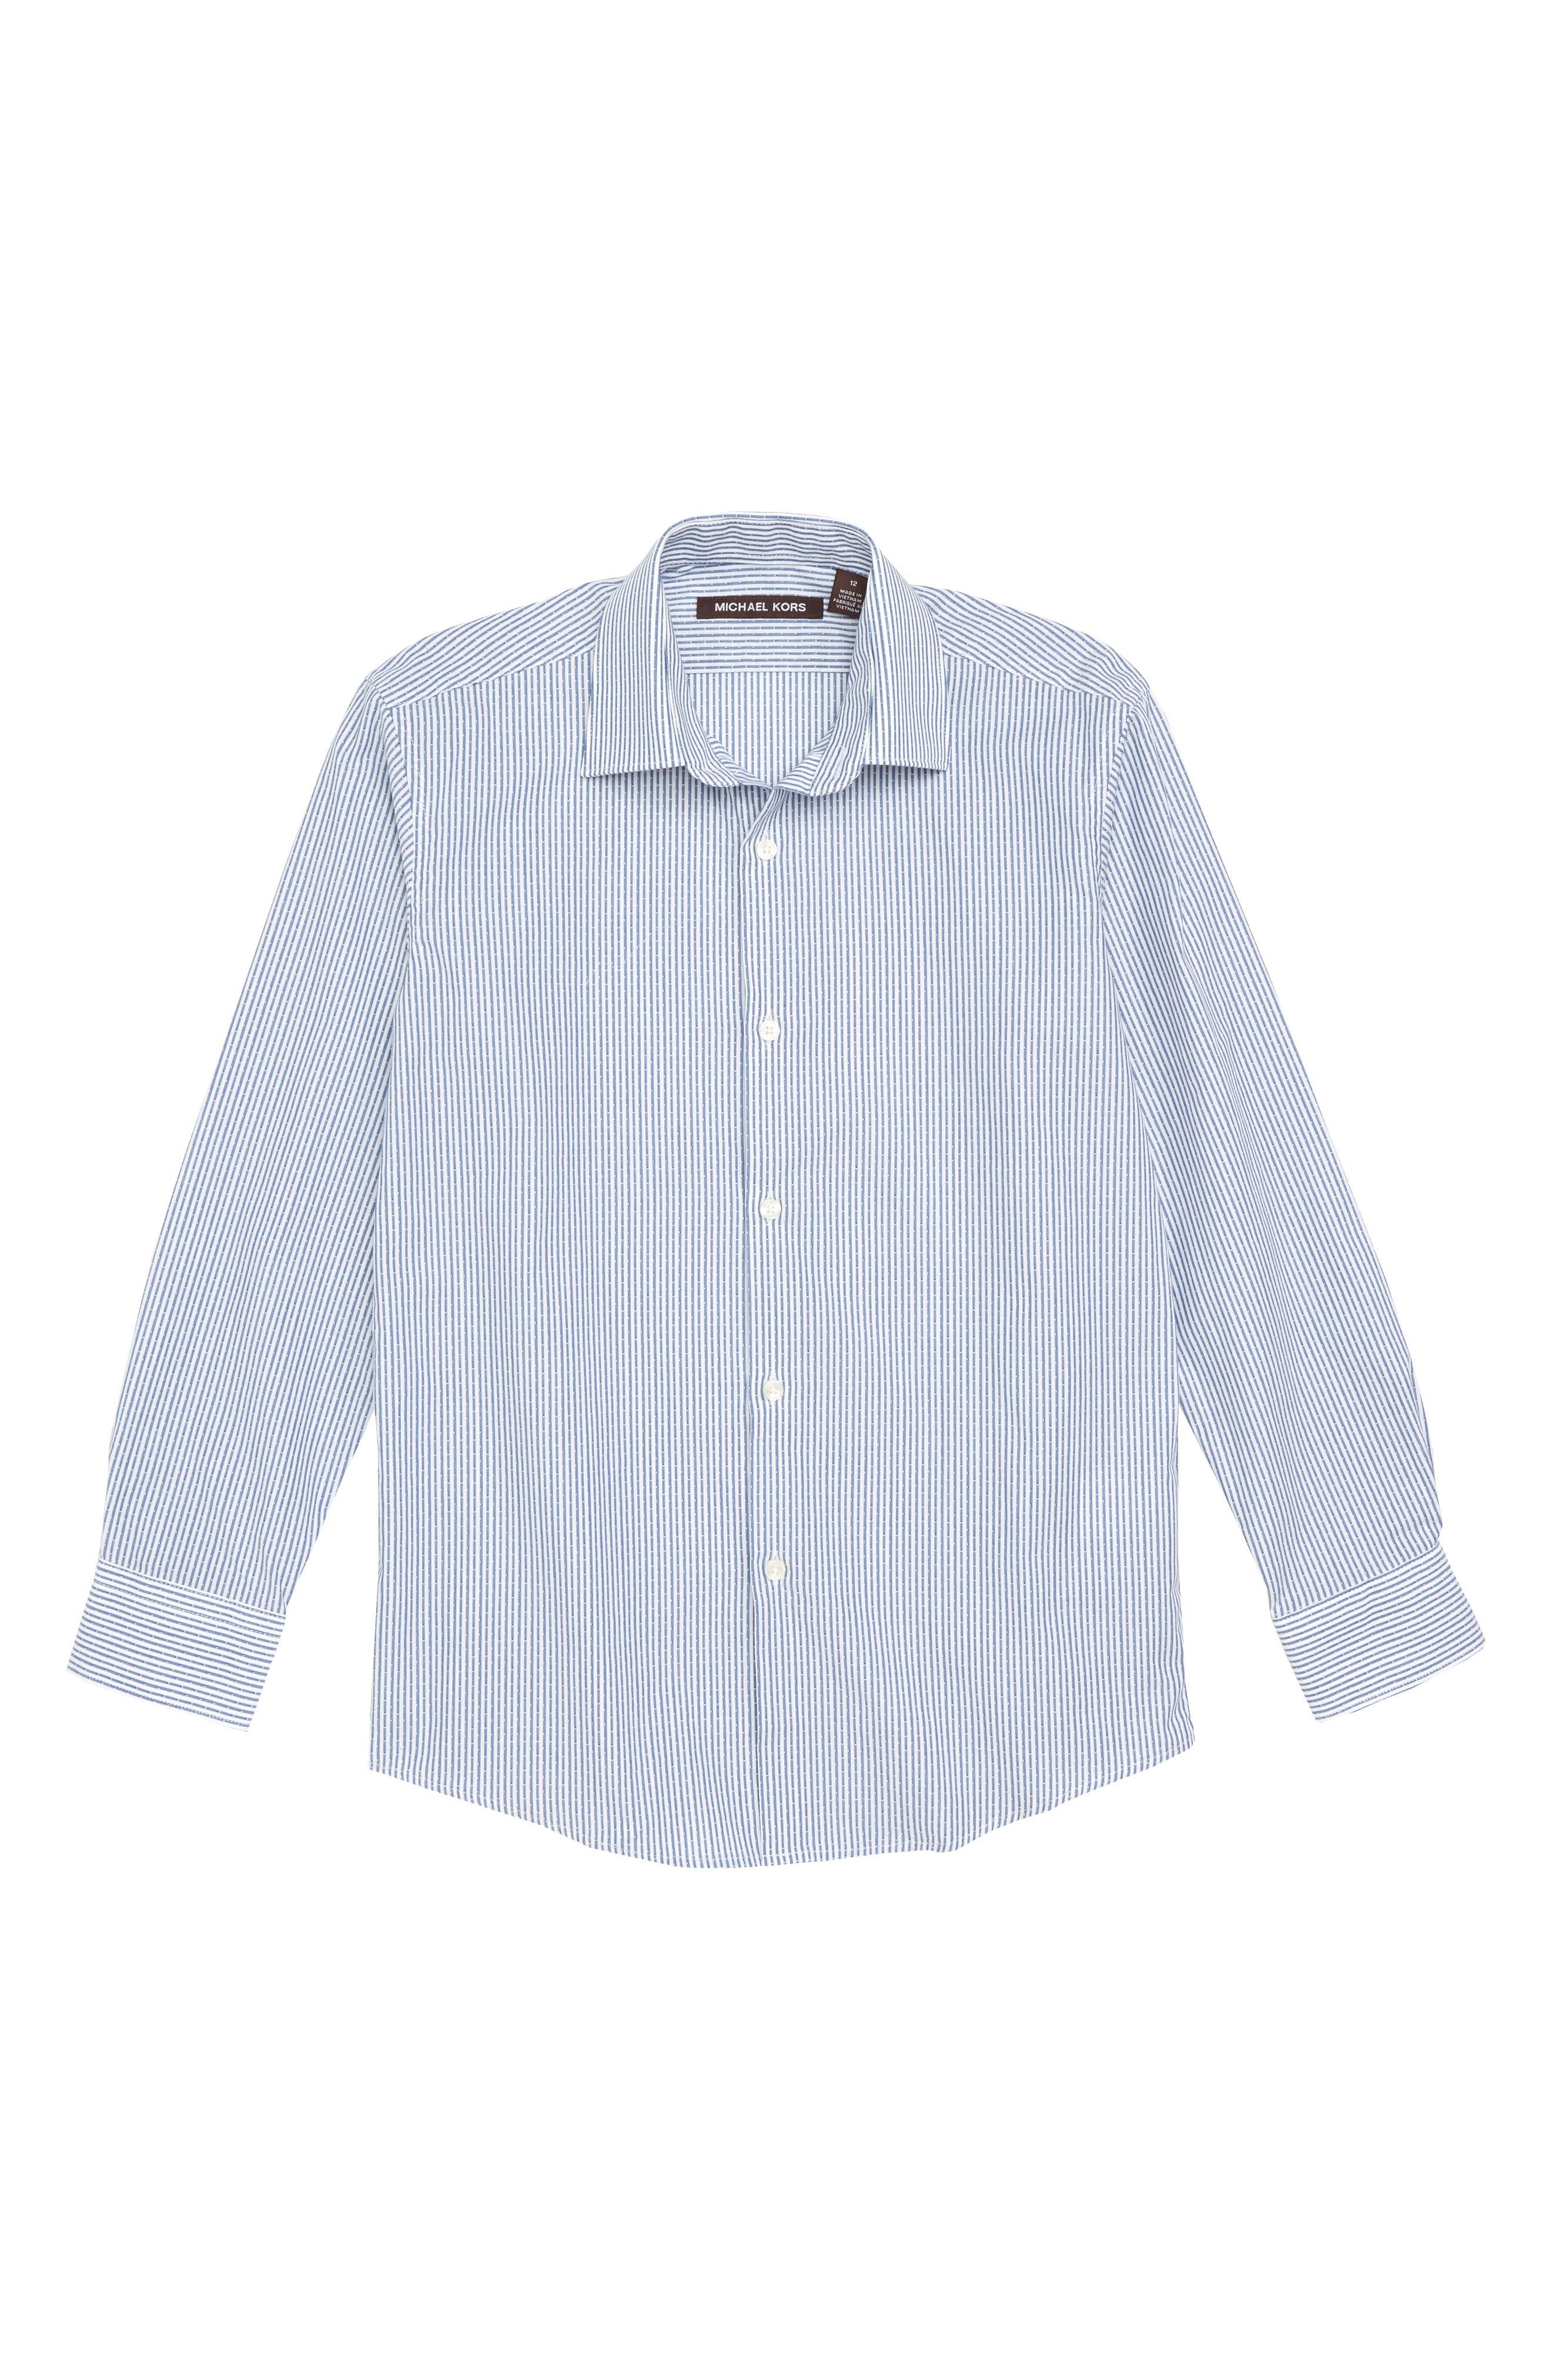 Stripe Dress Shirt,                             Main thumbnail 1, color,                             DARK BLUE